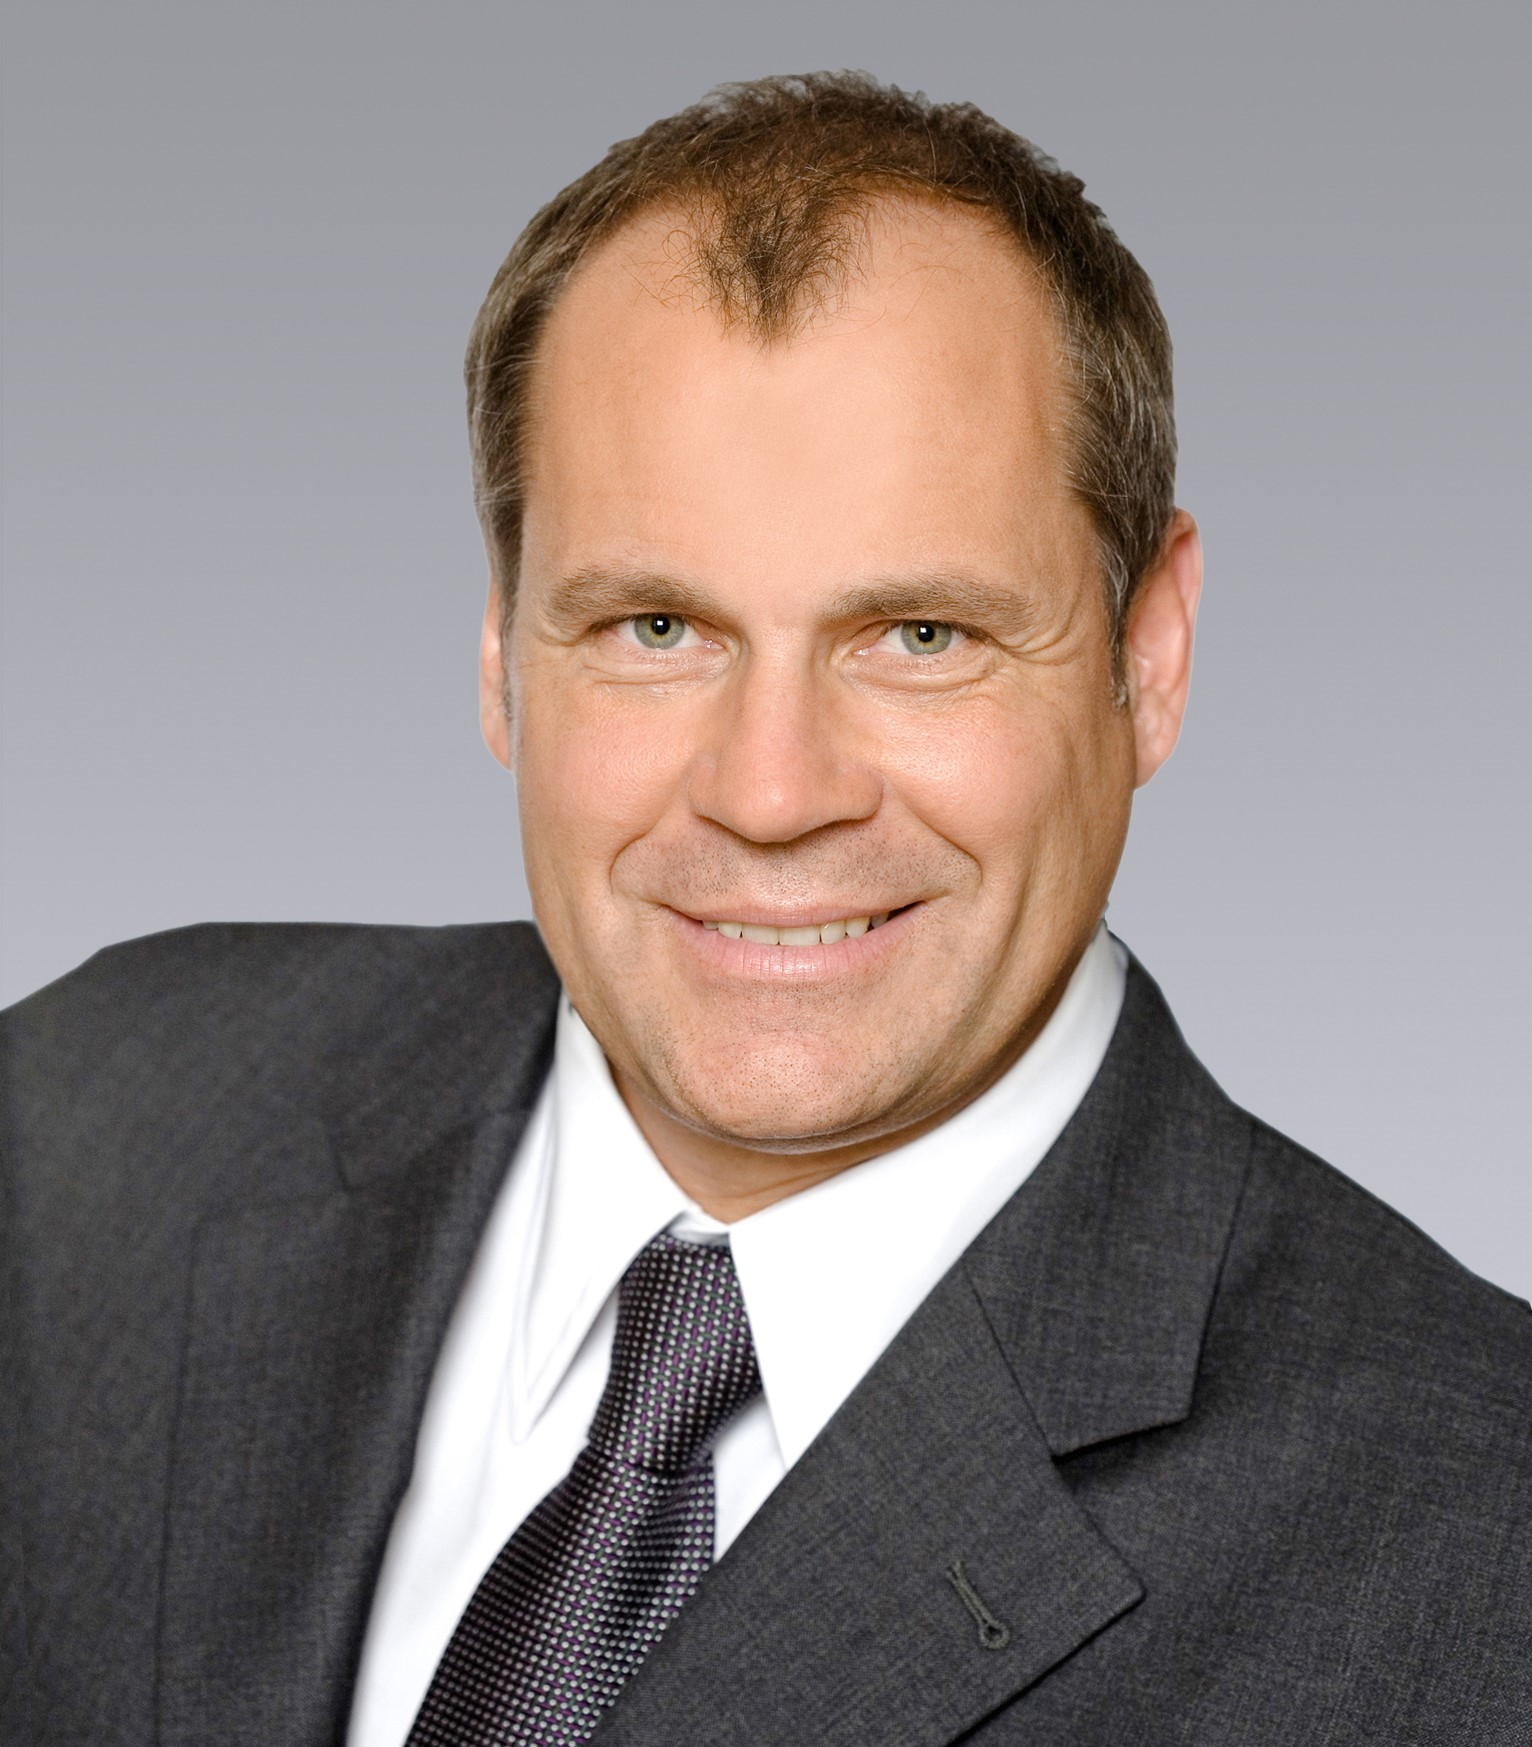 Maerz Harald Grau